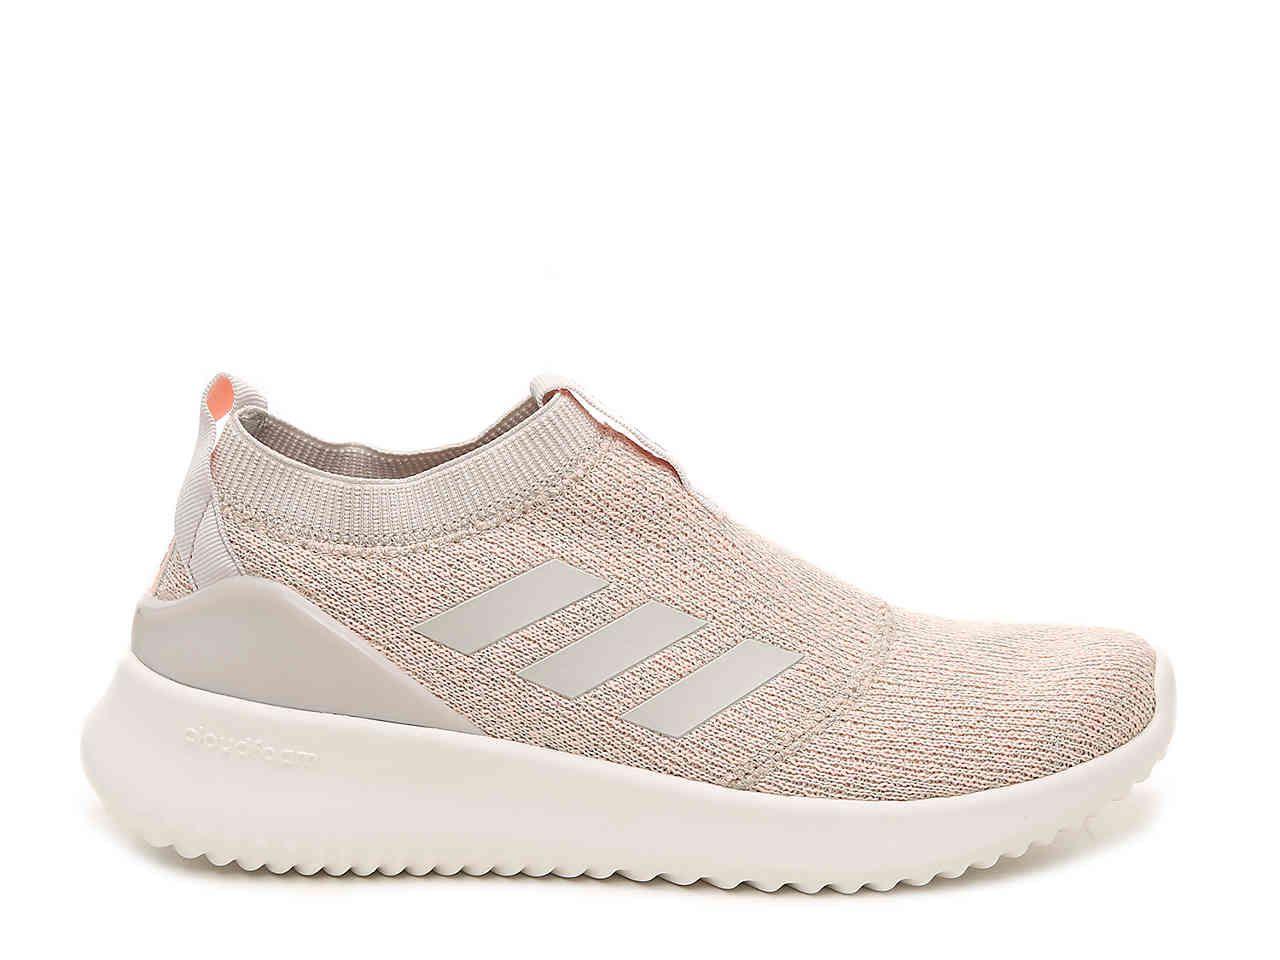 adidas Ultimafusion Slip-On Sneaker